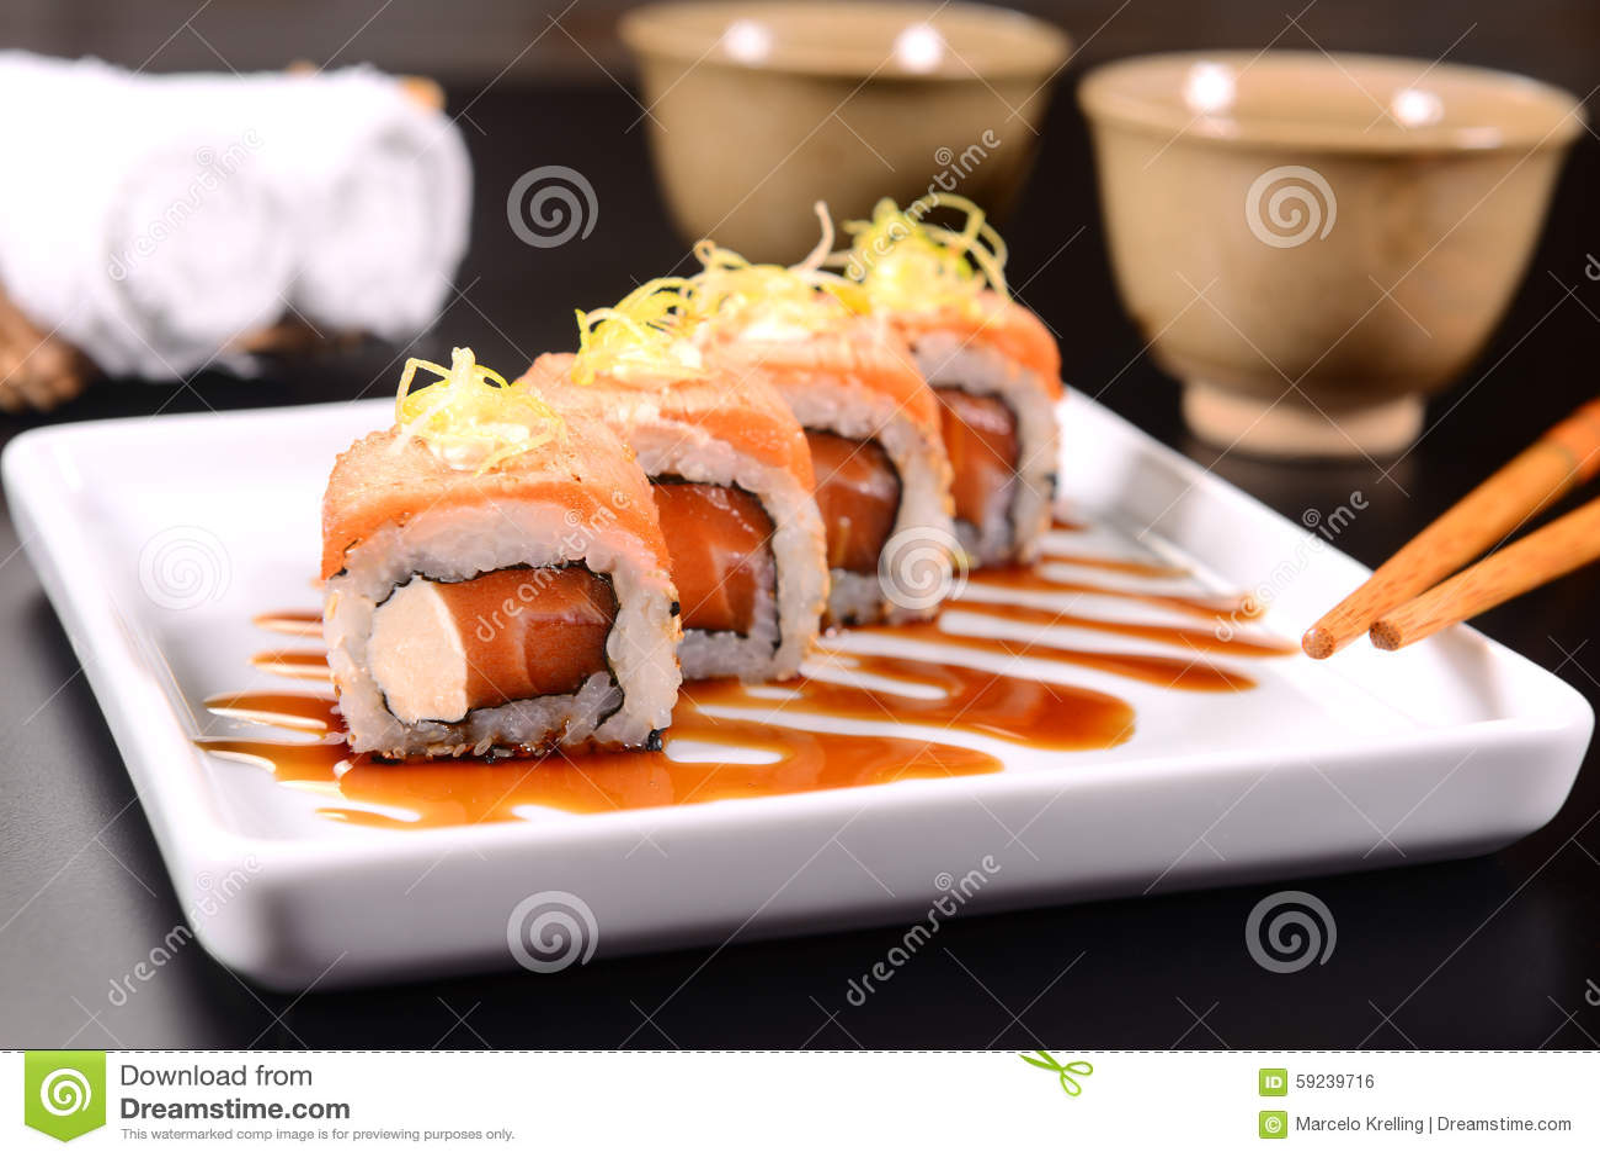 Download Sushi foto de archivo. Imagen de horizontal, estudio - 59239716